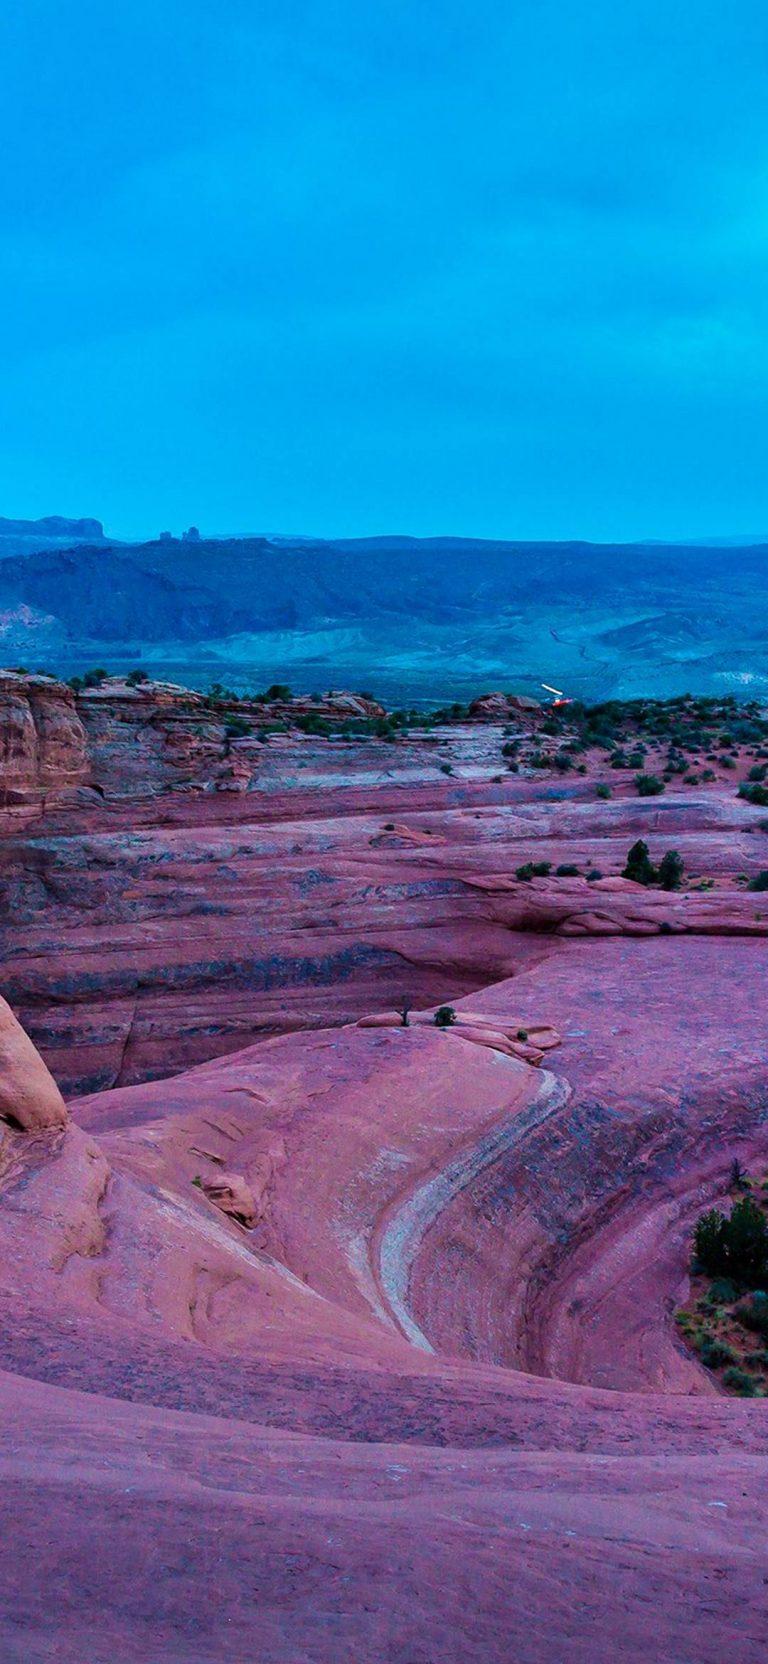 Rocks Stones Arch Desert 1080x2340 768x1664